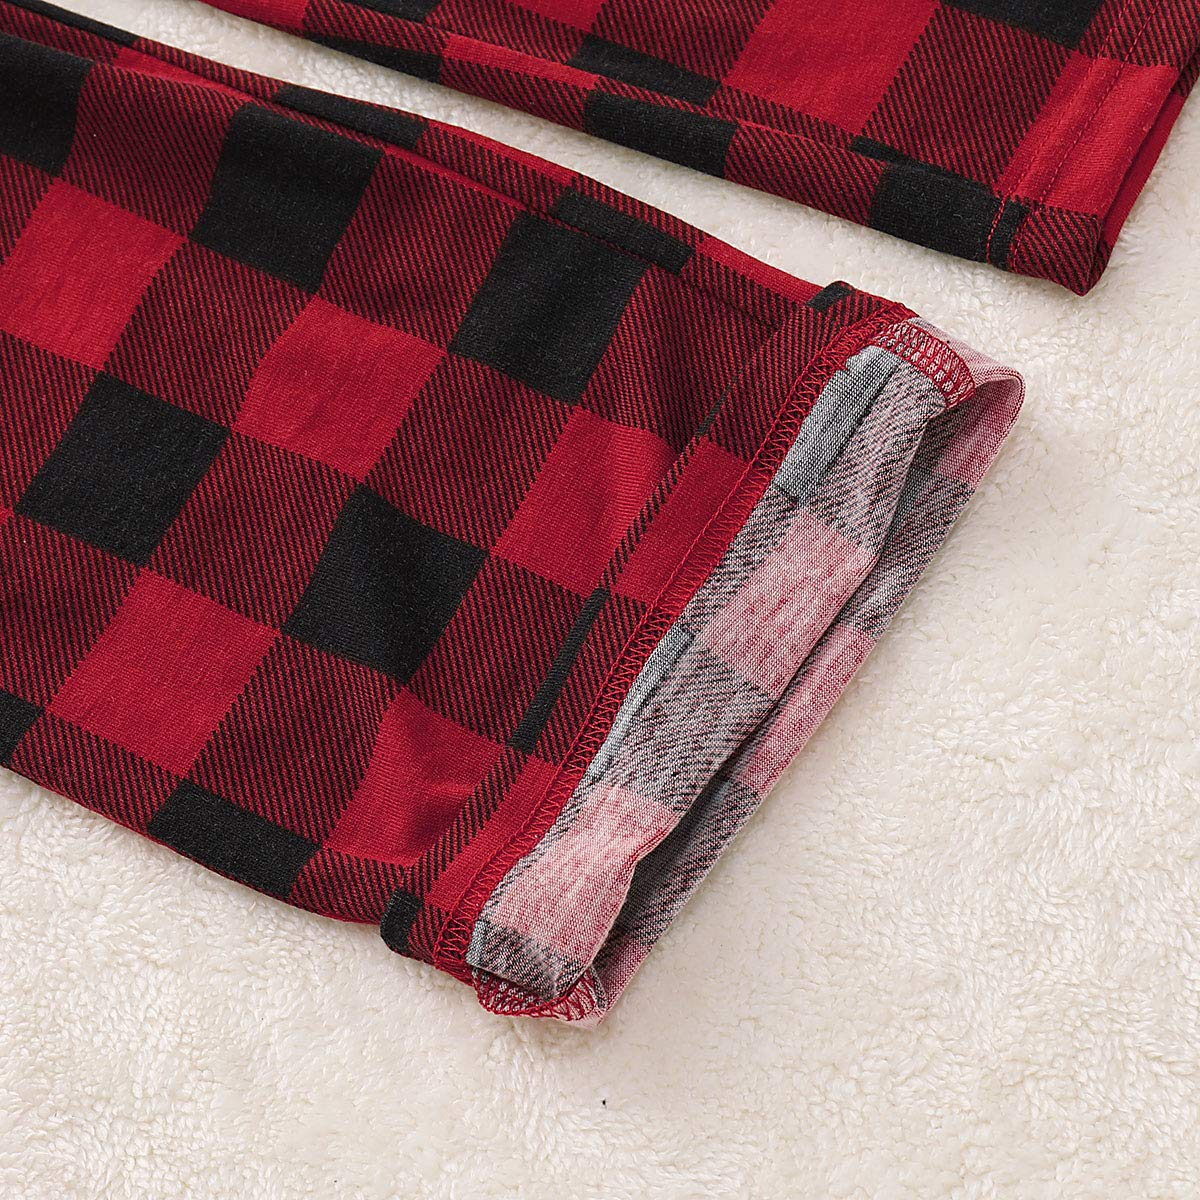 ZOEREA Christmas Pajama Family Matching Deer Cotton Sleepwear Homewear for Unisex Kids Newborn Toddler